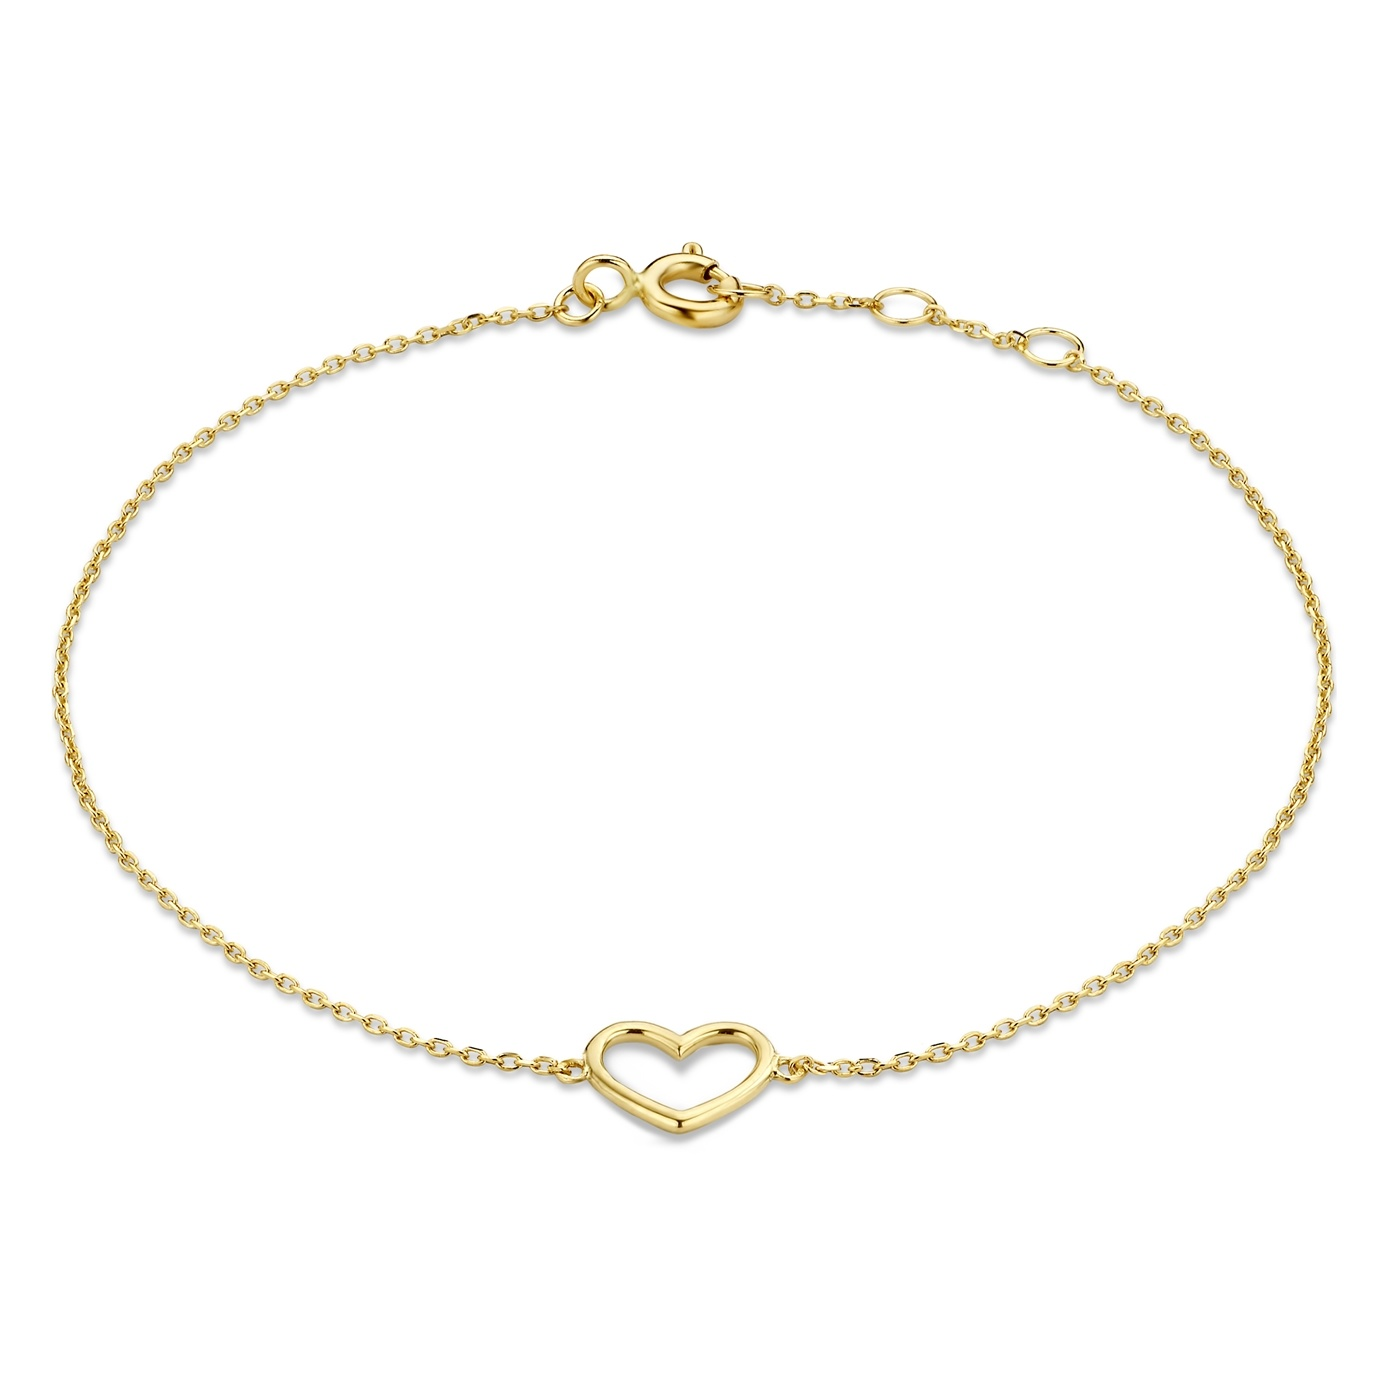 Isabel Bernard Le Marais Alix 14 karaat gouden armband hart